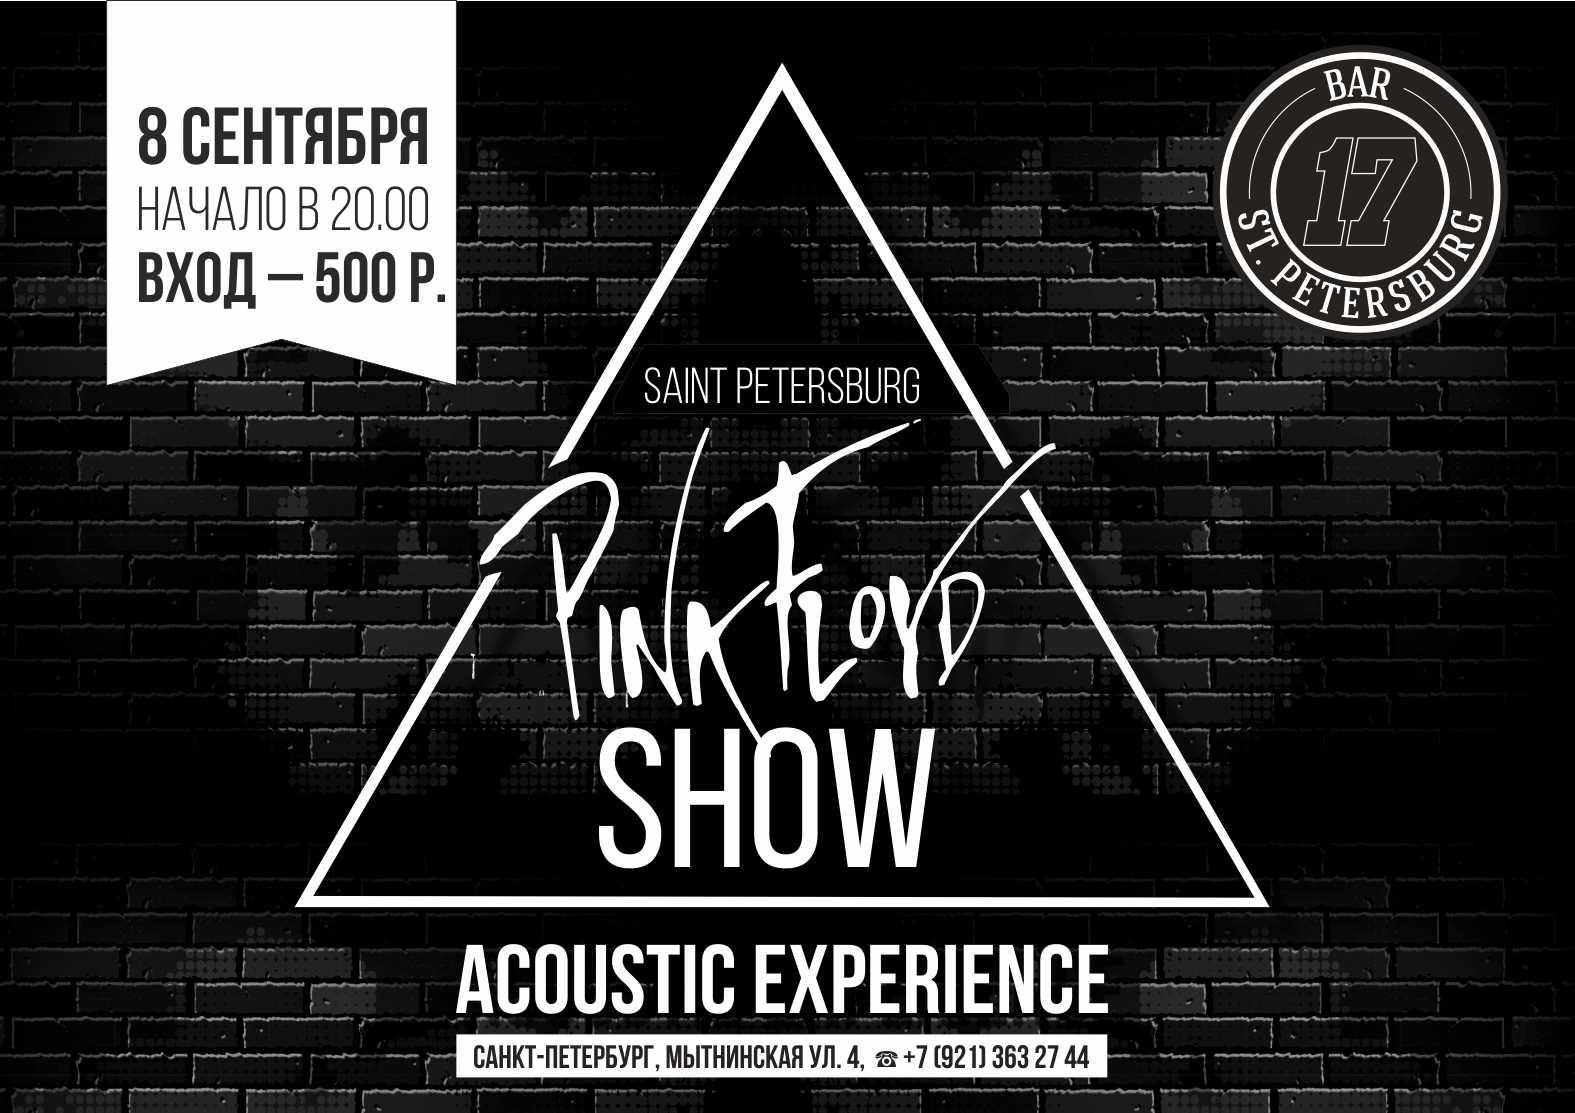 Saint Petersburg Pink Floyd Show в Баре 17